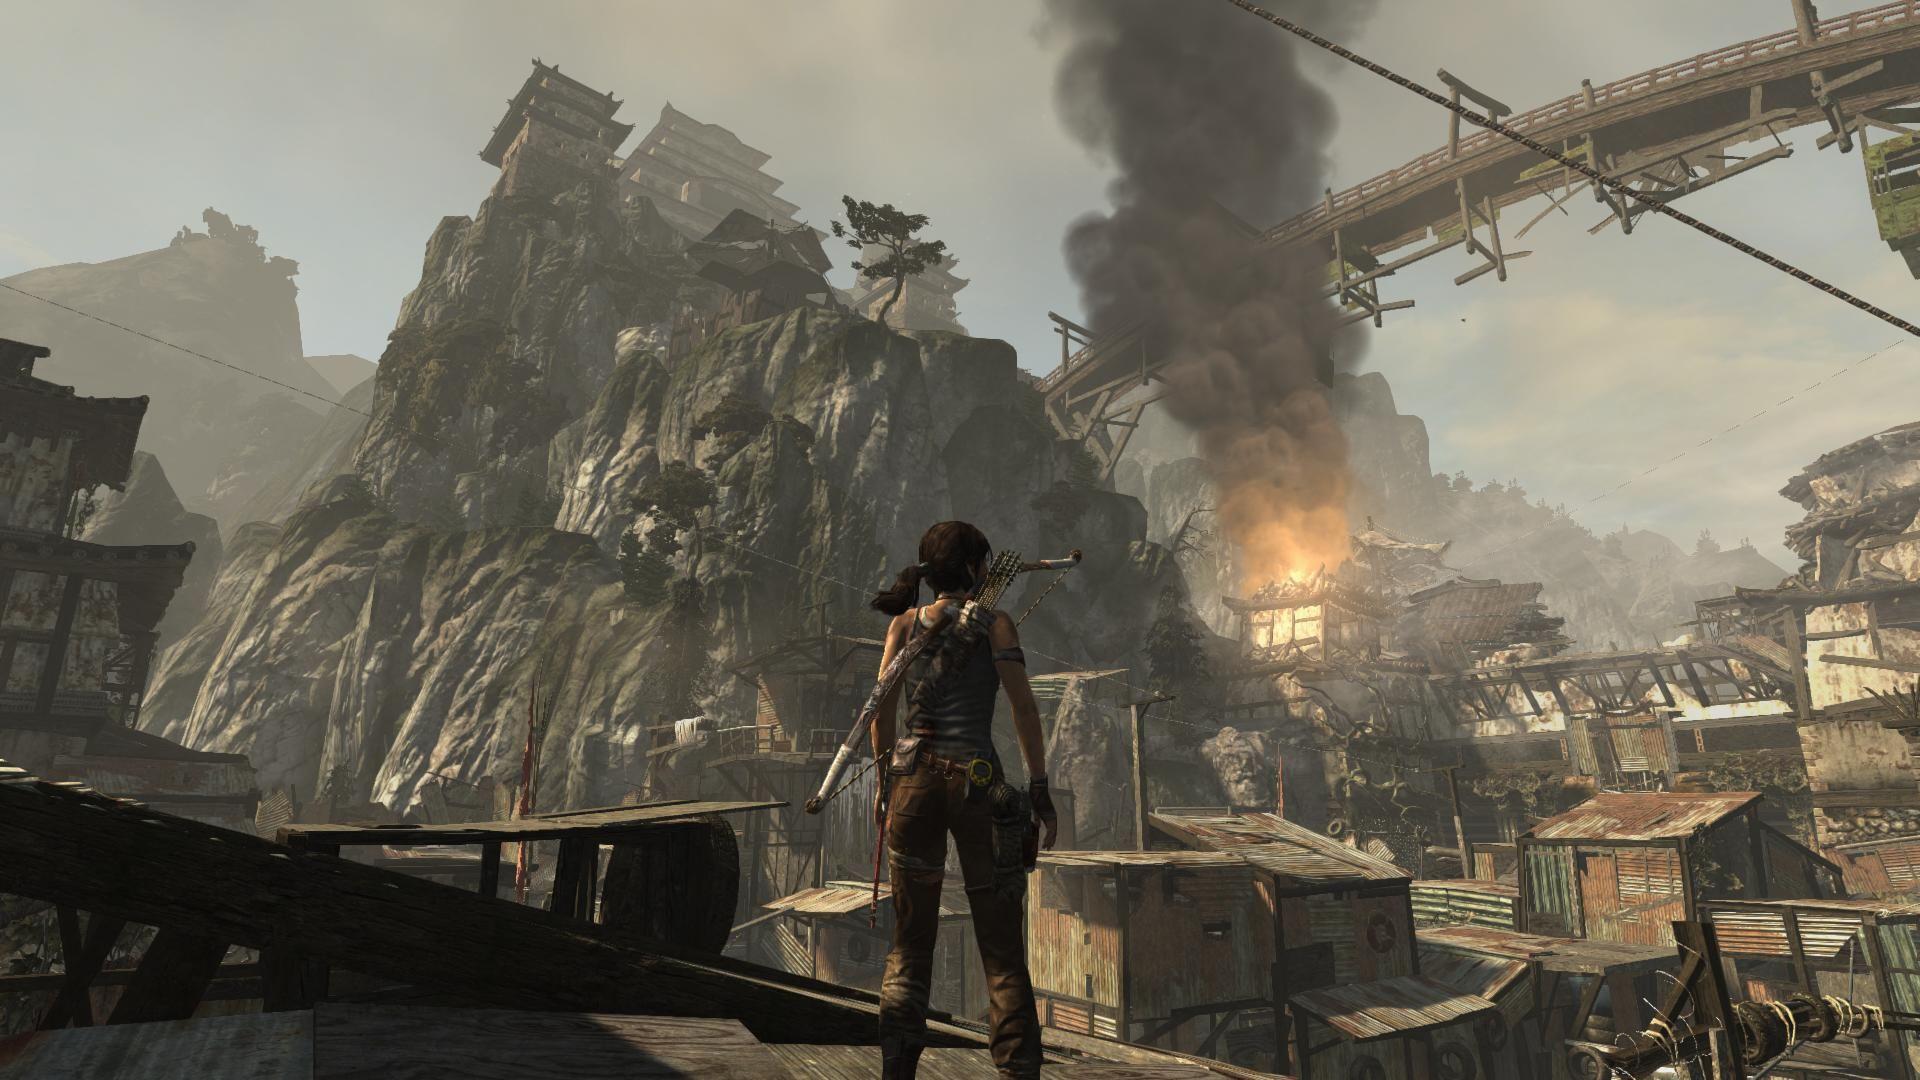 Tomb Raider 2013 Gameplay Tomb Raider 2013 Tomb Raider Game